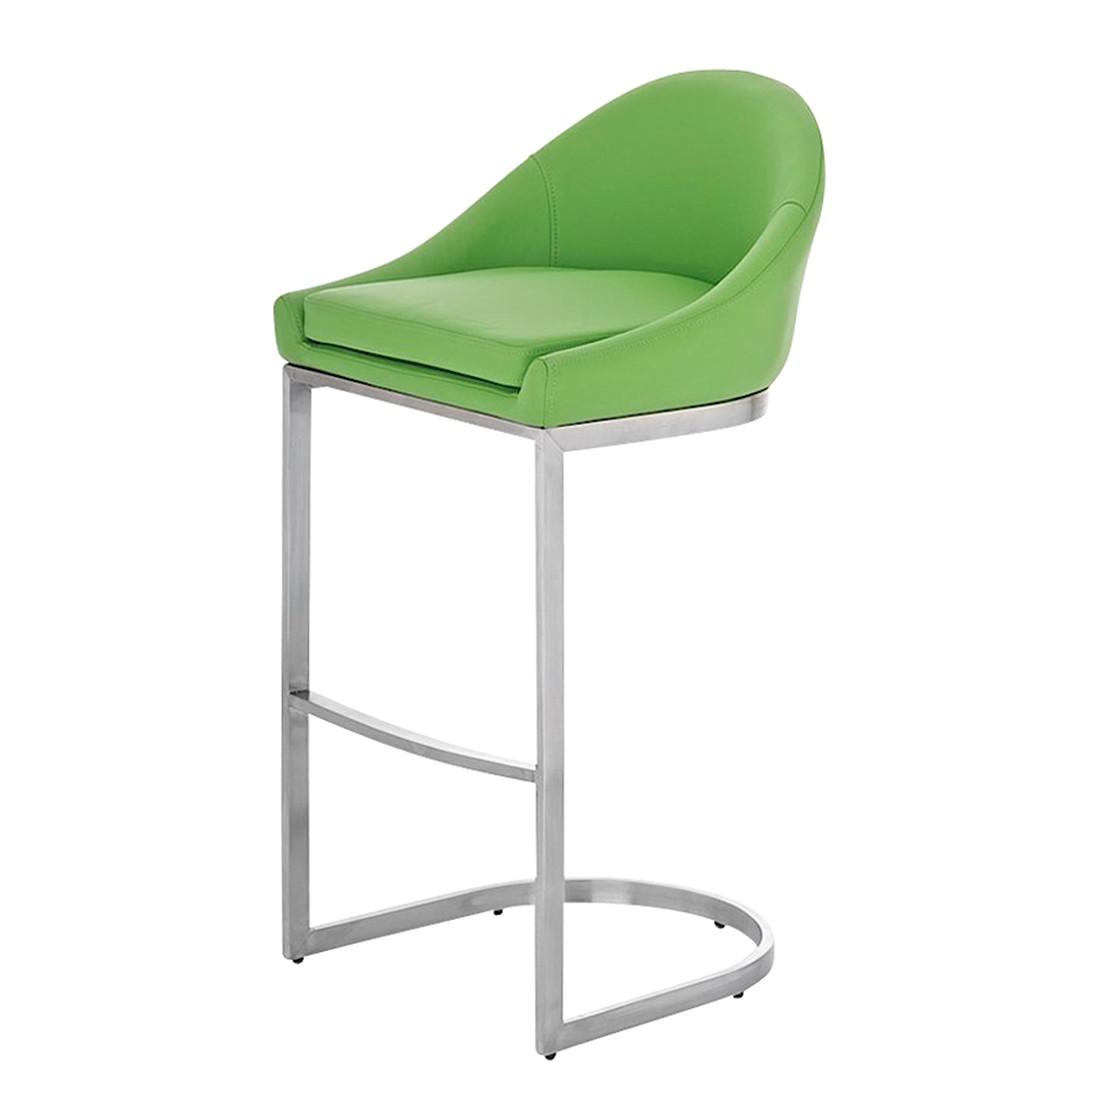 Barhocker Kreta – Grün -Edelstahl/Kunstleder, CLP jetzt bestellen